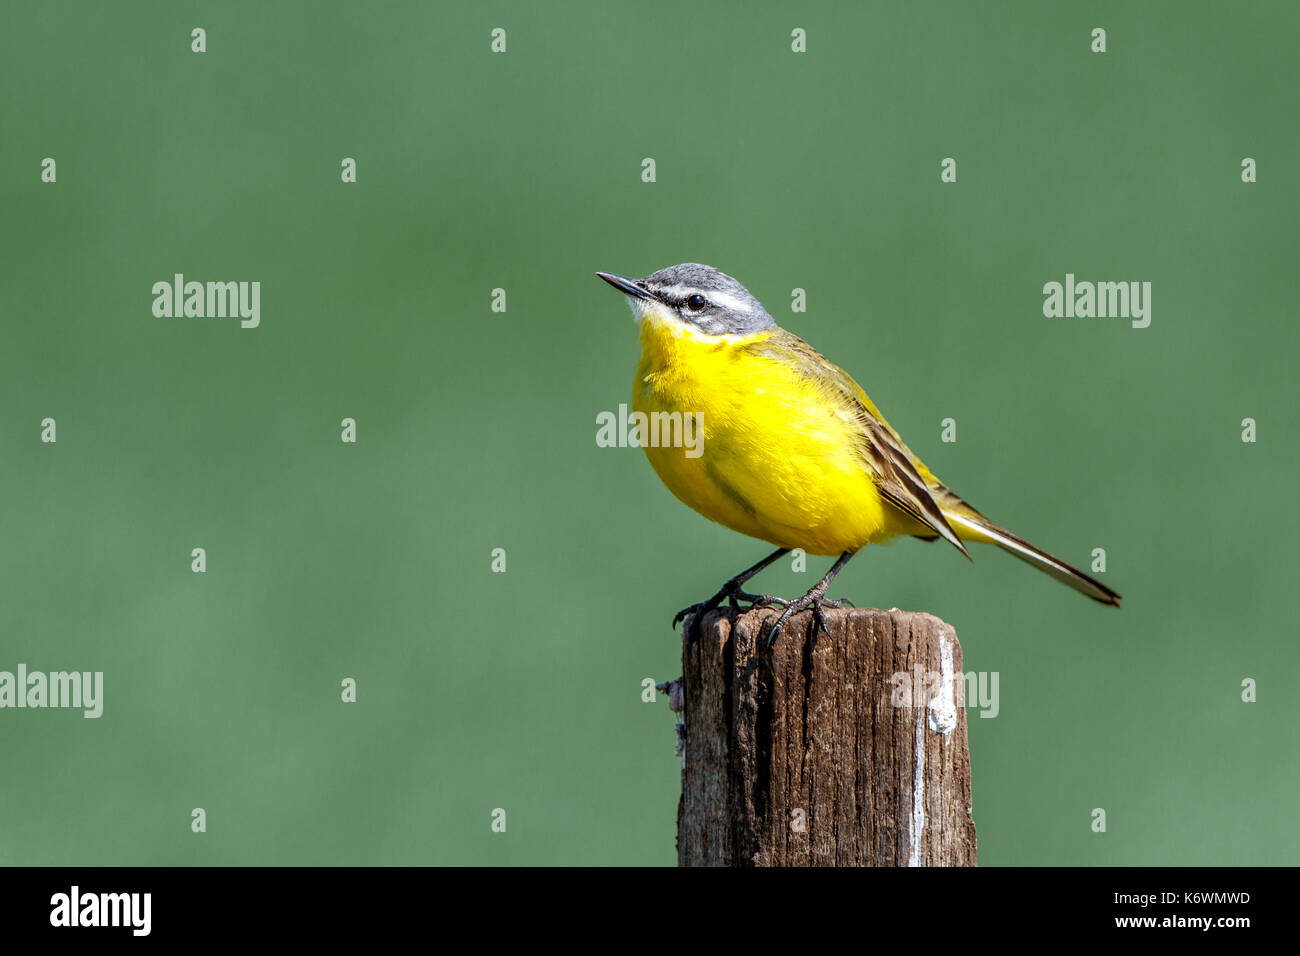 Yellow wagtail (Motacilla flava), on fence post, Burgenland, Austria - Stock Image